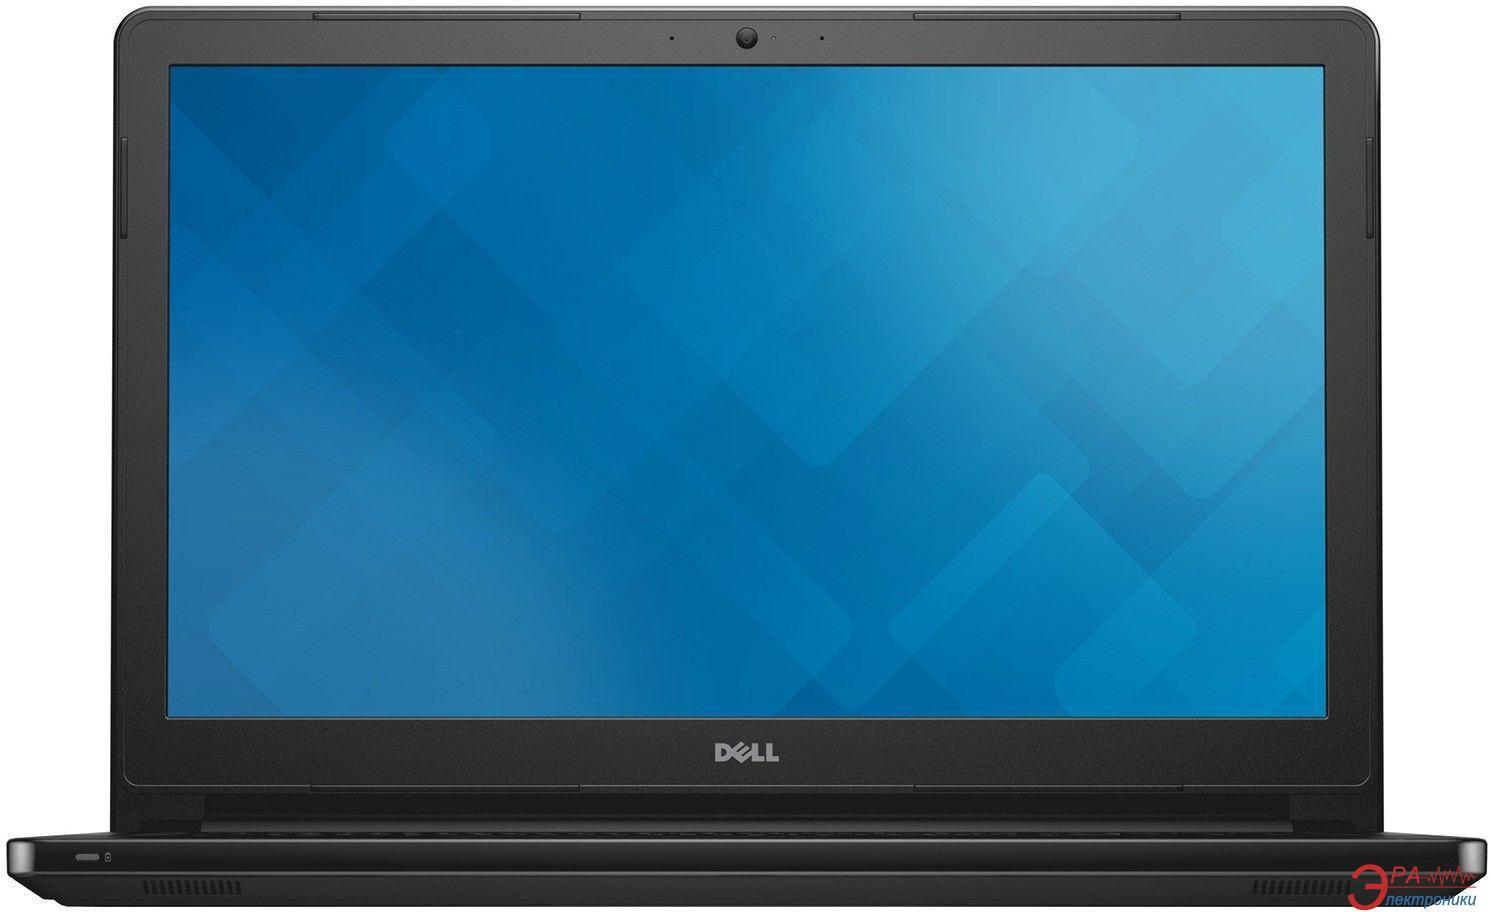 Ноутбук Dell Vostro 3558 (VAN15BDW1701_018_R_UBU) Black 15,6